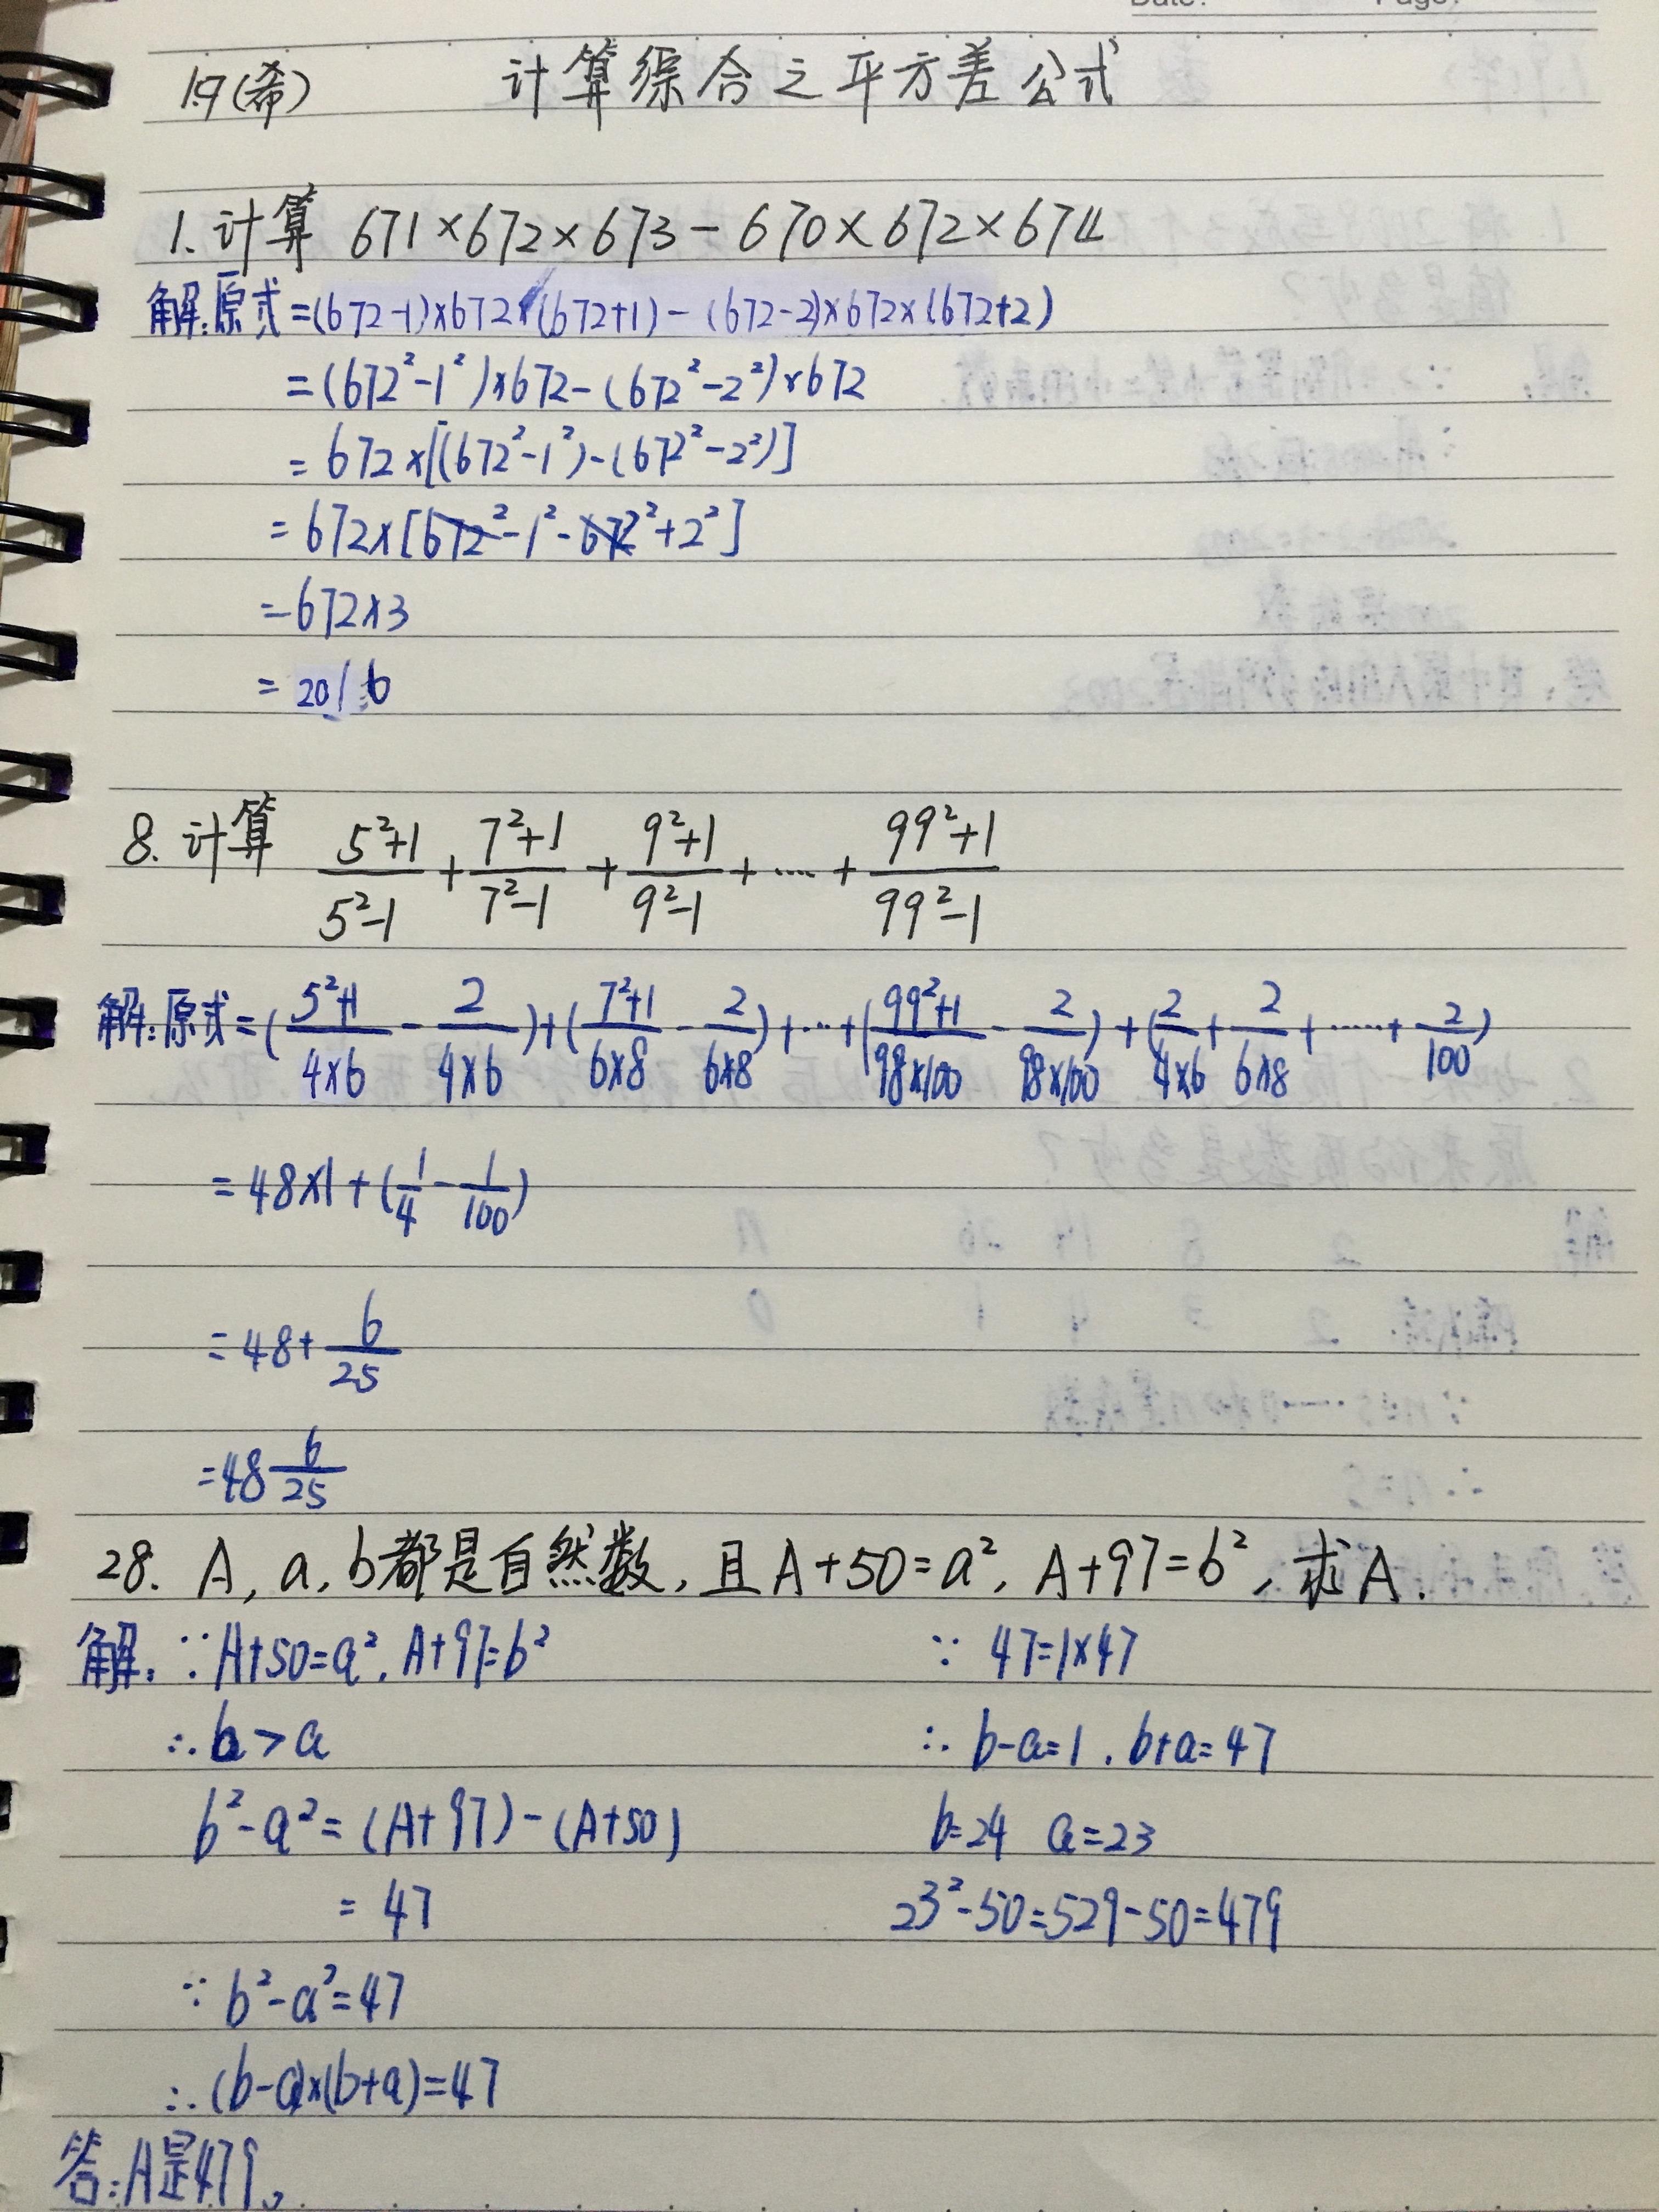 01AC5EDA-A88D-4DB1-8240-364BBA555AB9.jpg